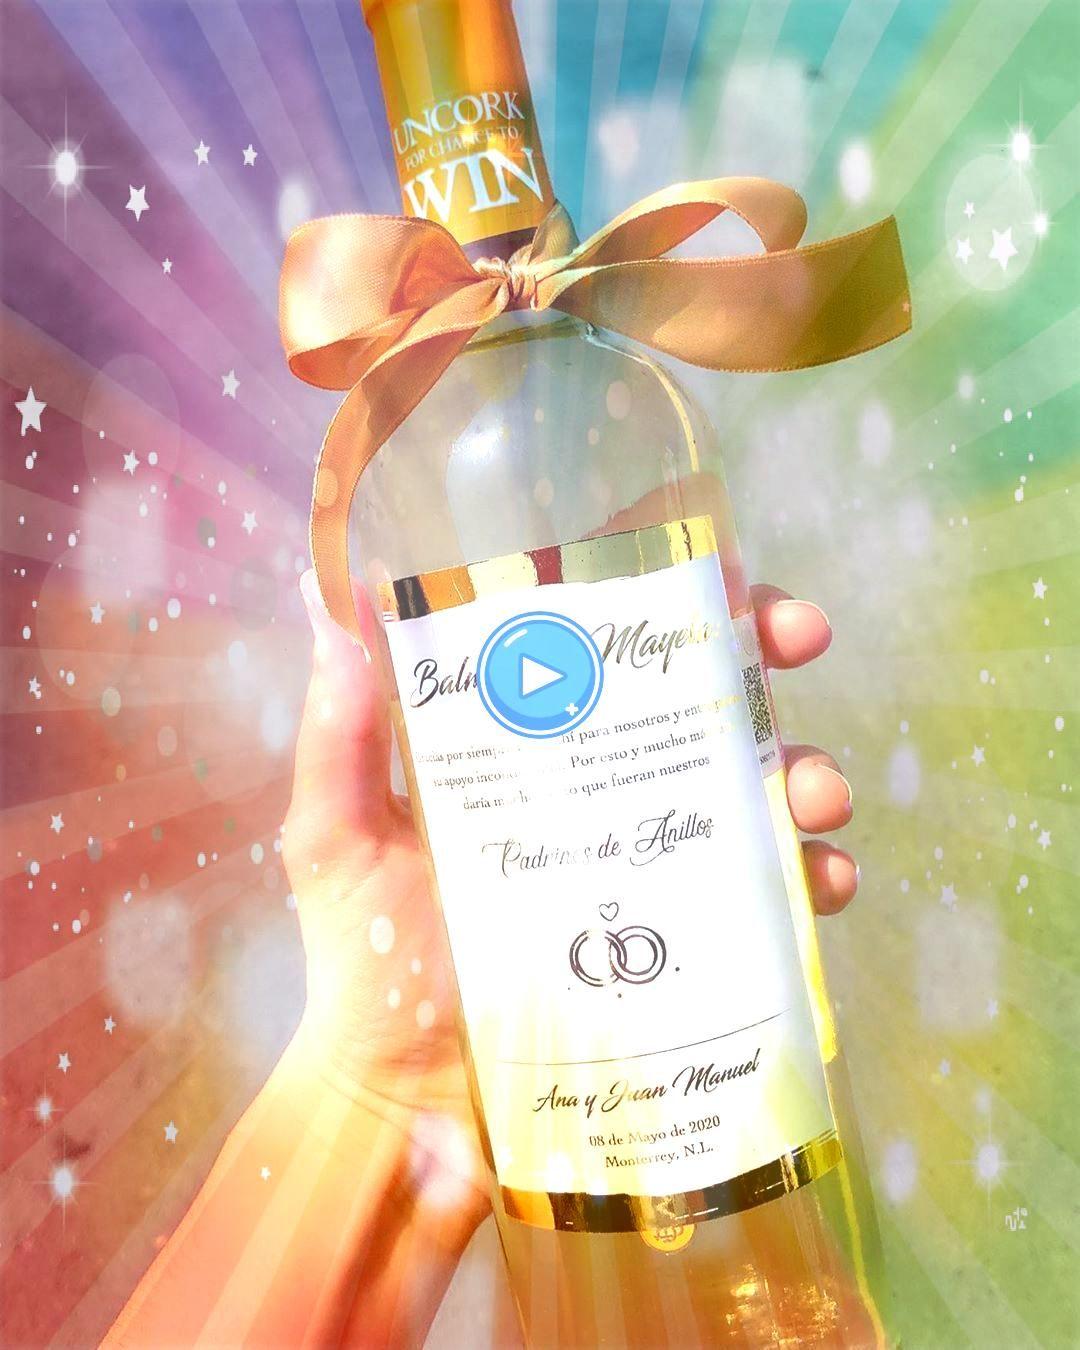 de vino blanco con etiqueta personalizada dorada  Escríbenos para más información  Detalle de vino blanco con etiqueta personalizada dorada  Escr&iac...